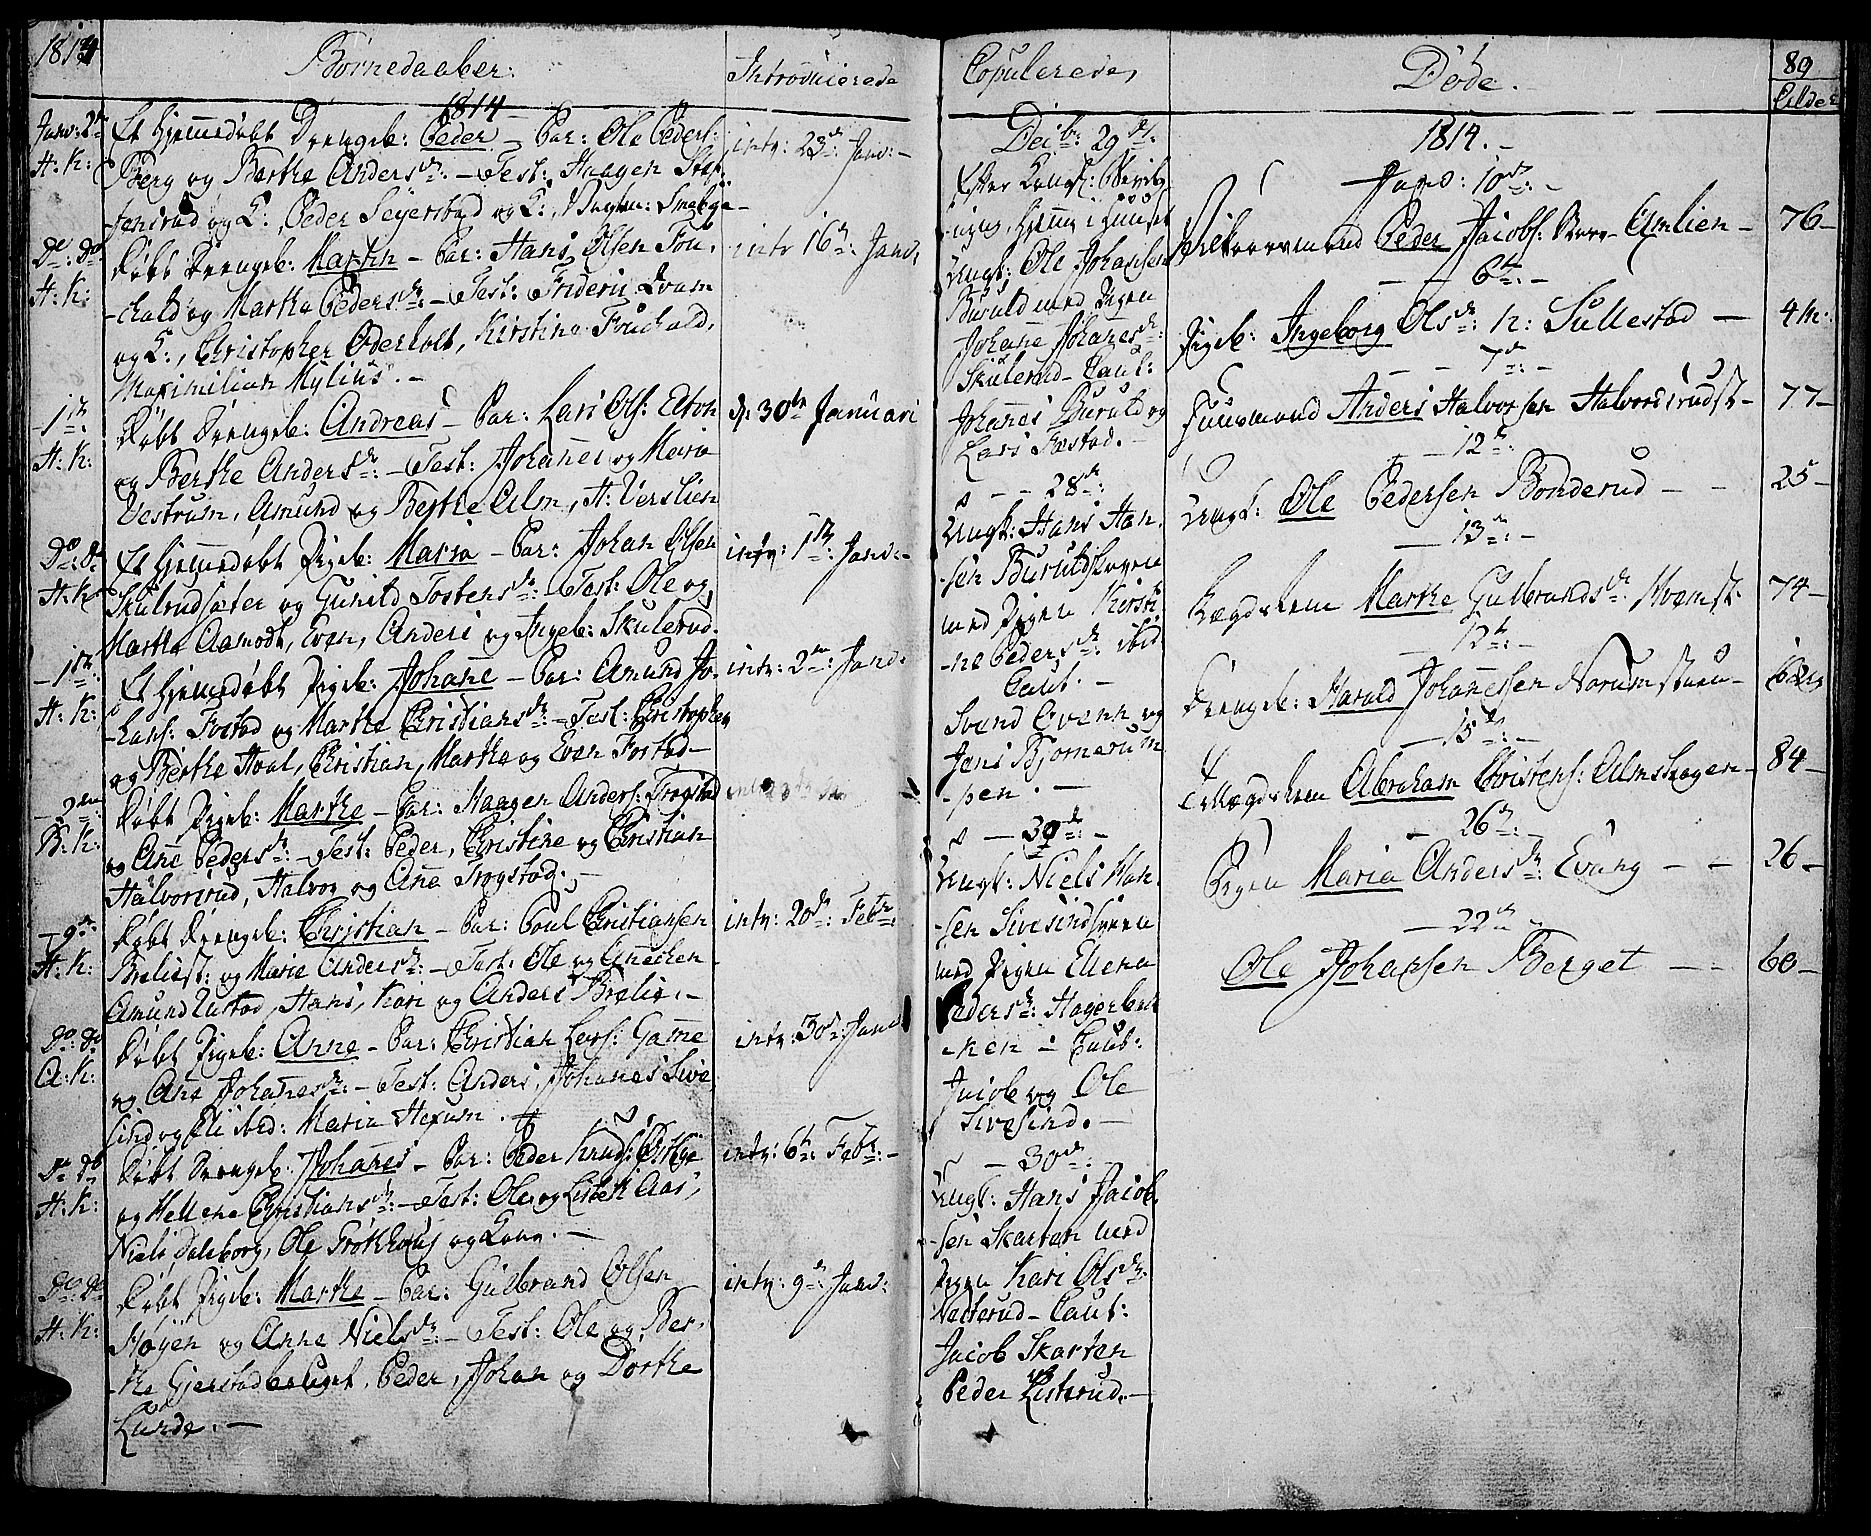 SAH, Toten prestekontor, Ministerialbok nr. 8, 1809-1814, s. 89